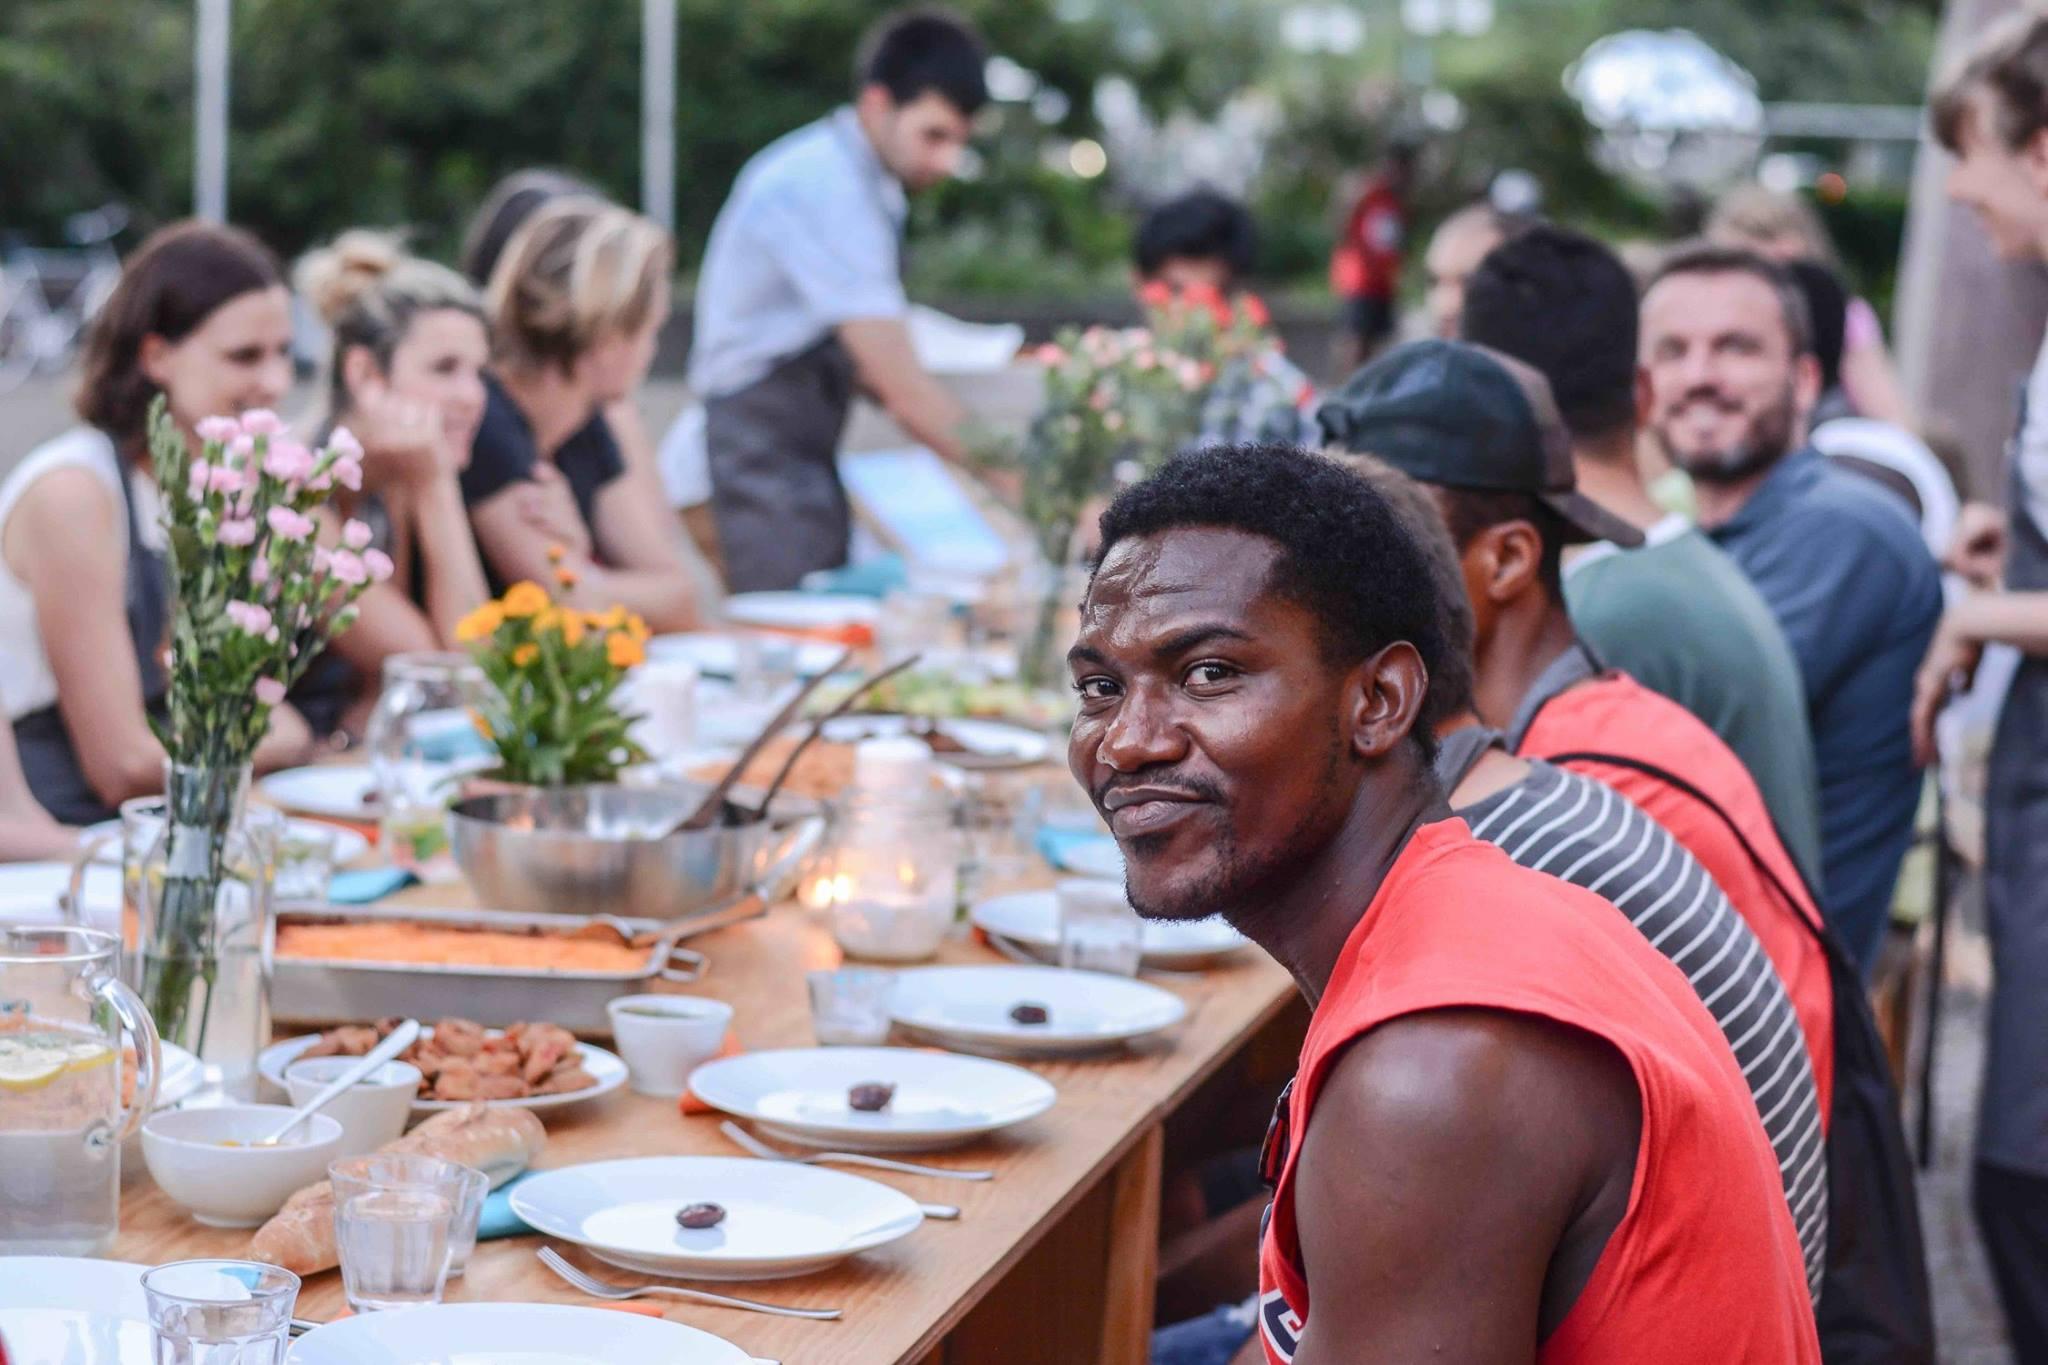 014_Kamerun Dinner.jpg